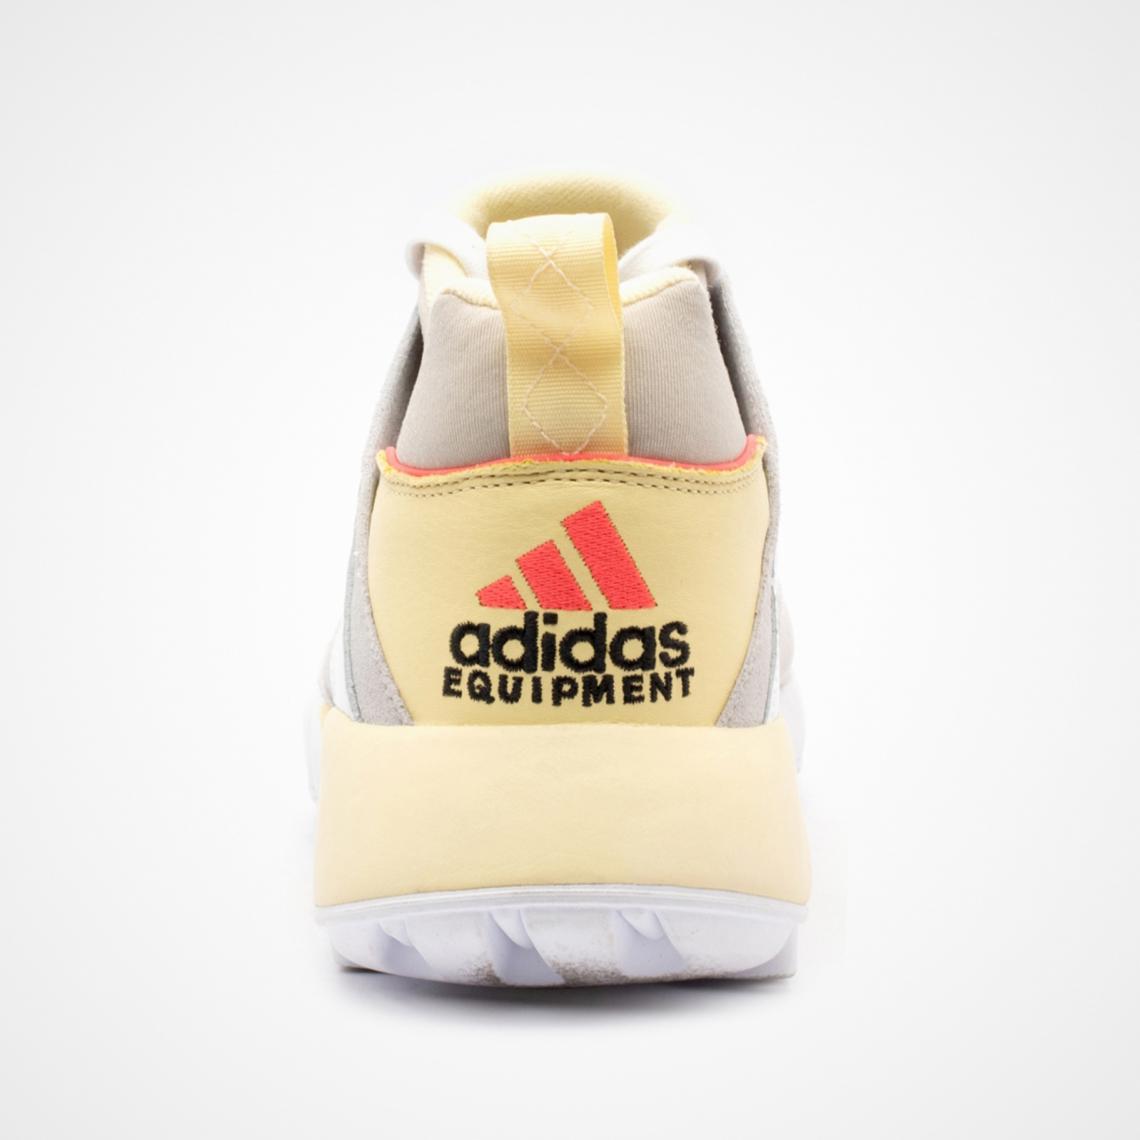 quality design af180 5a5e0 adidas EQT Cushion 2 Beige DB2718 Release Info | SneakerNews.com